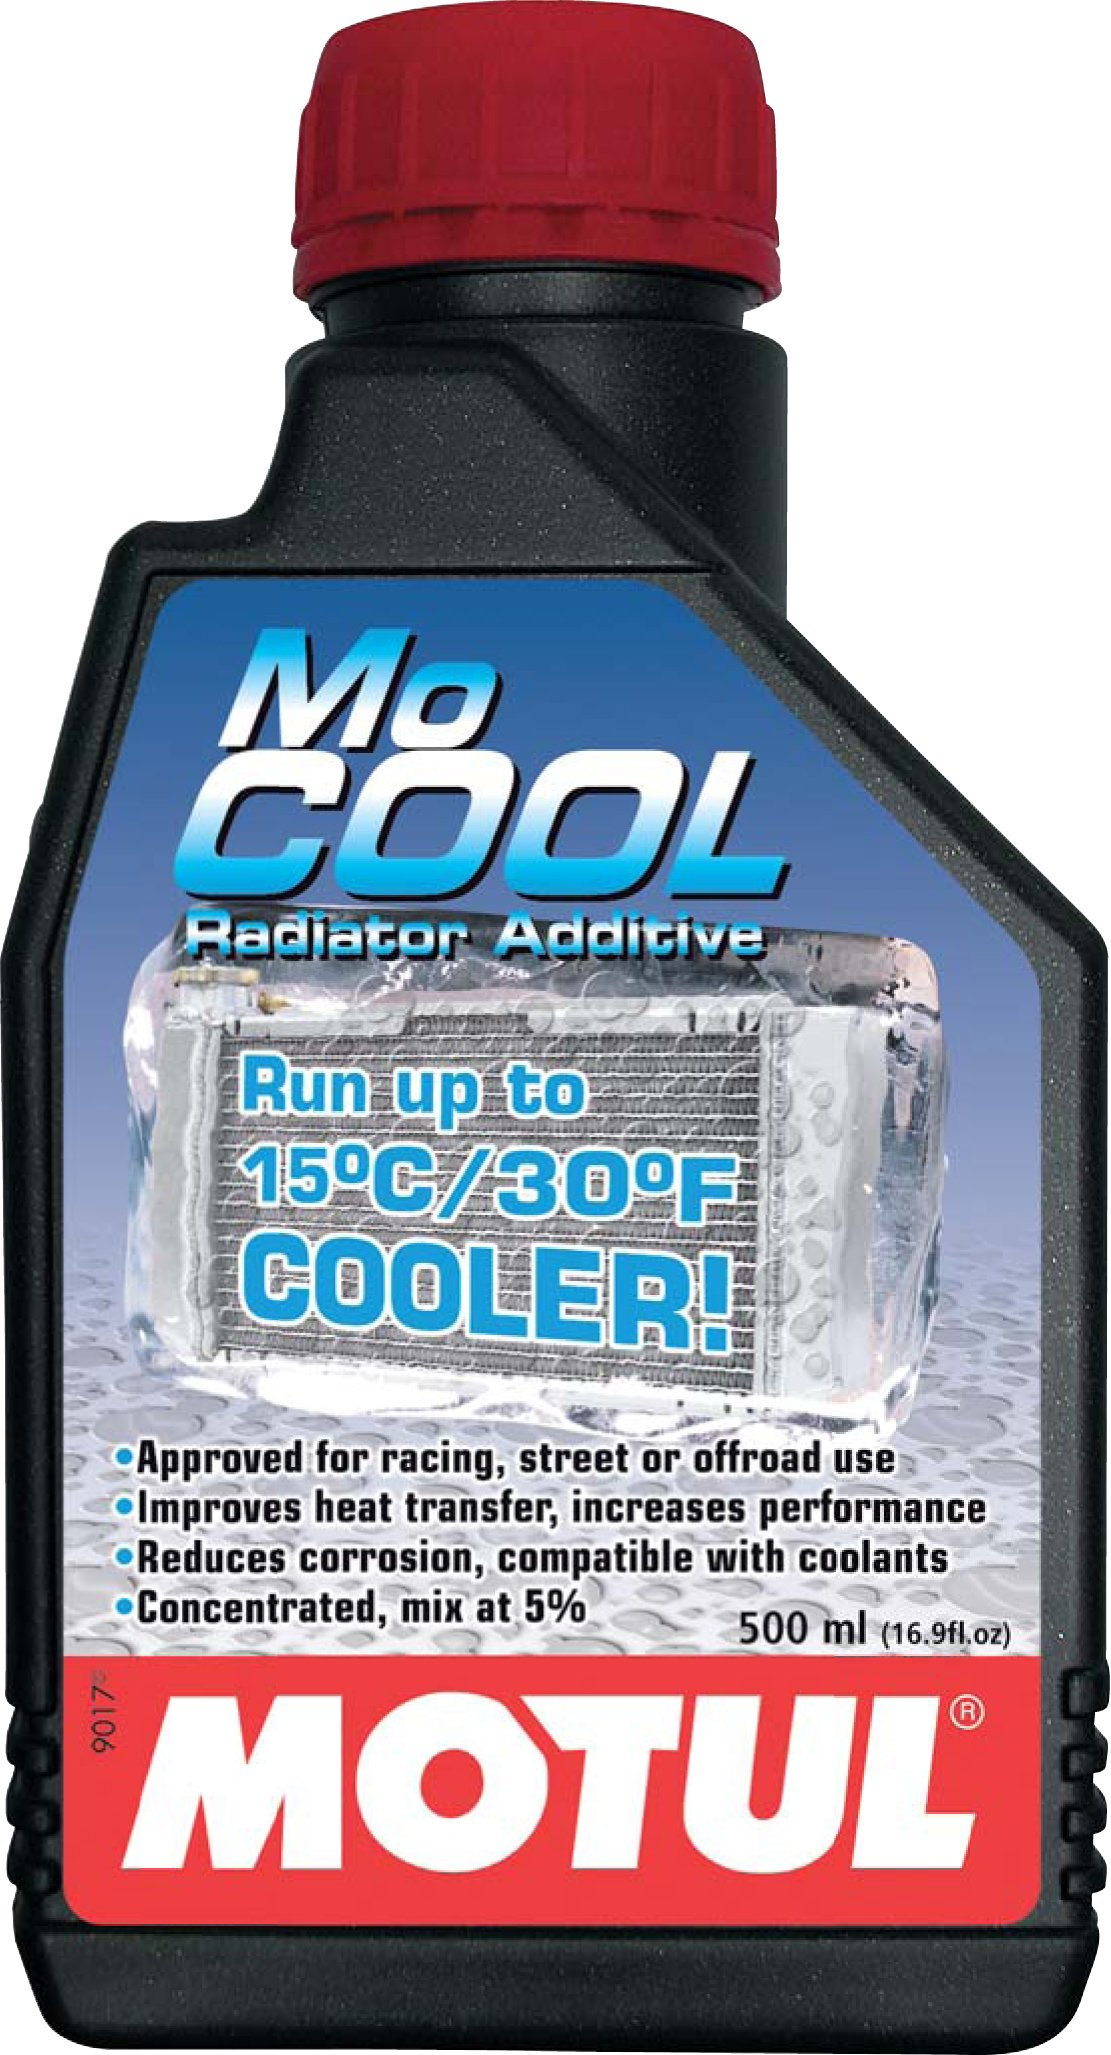 Motul MoCool (Radiator Additive) (Pack of 2) by Motul